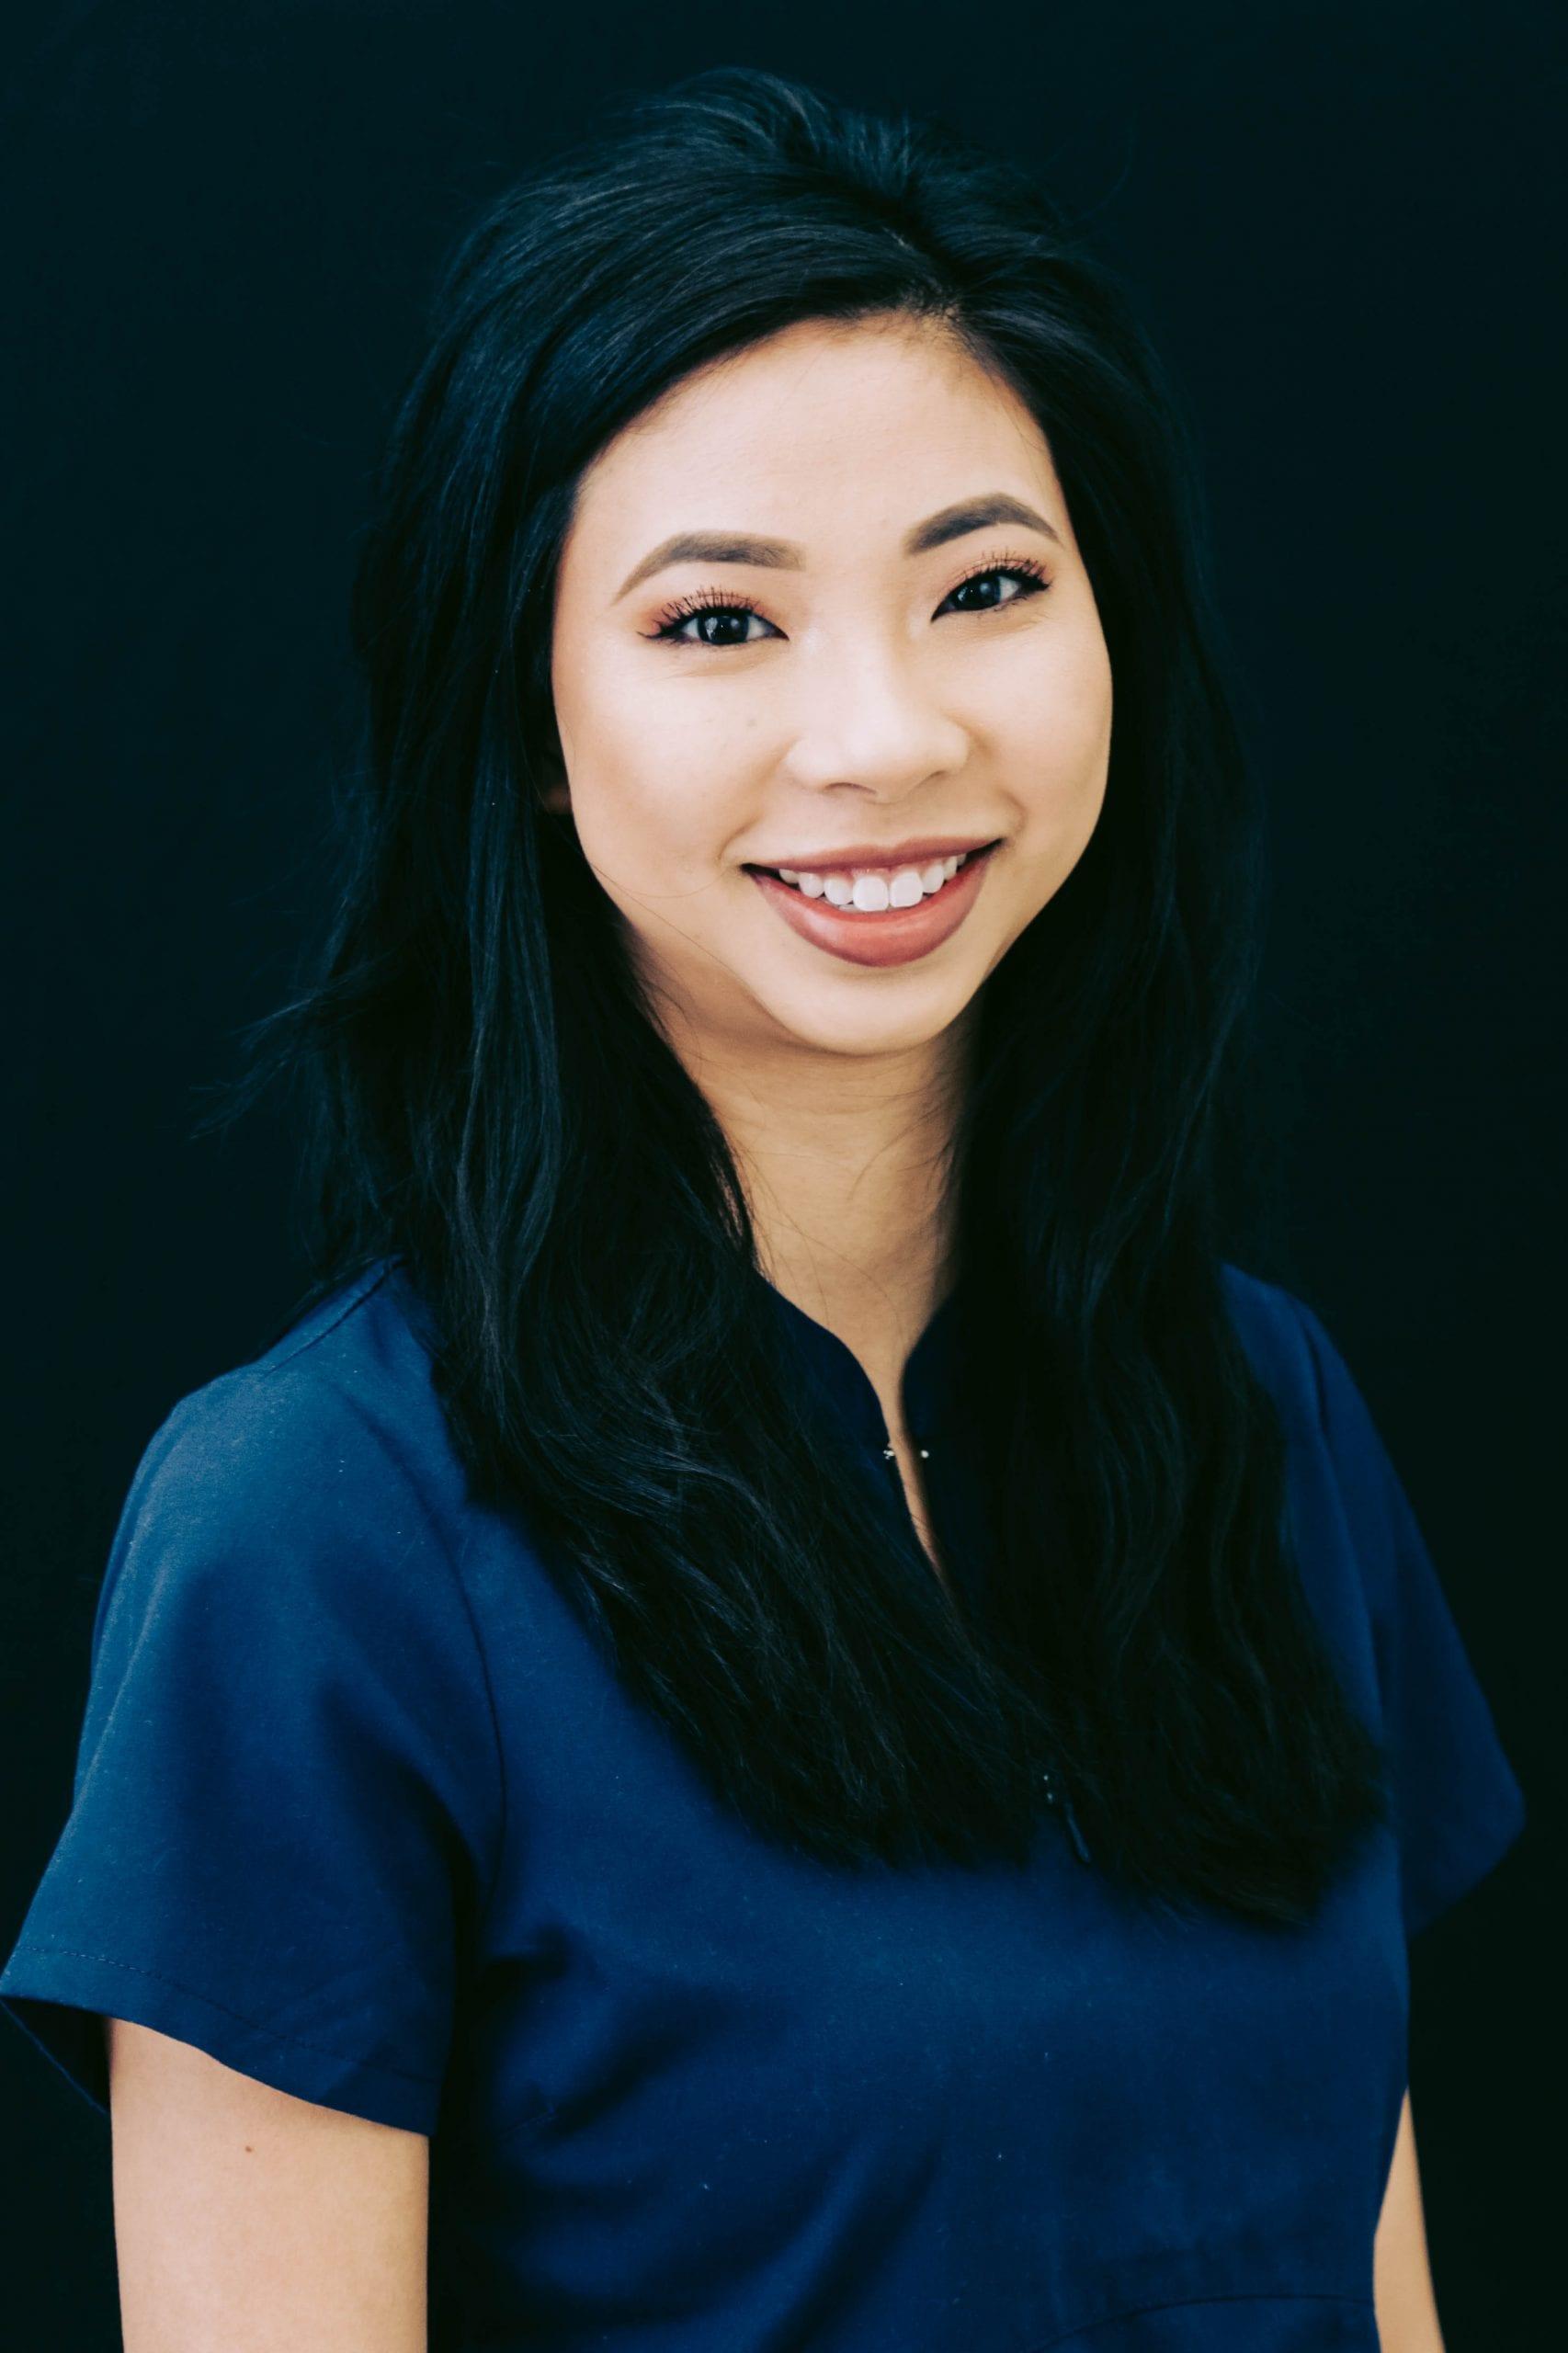 empowered asian woman headshot